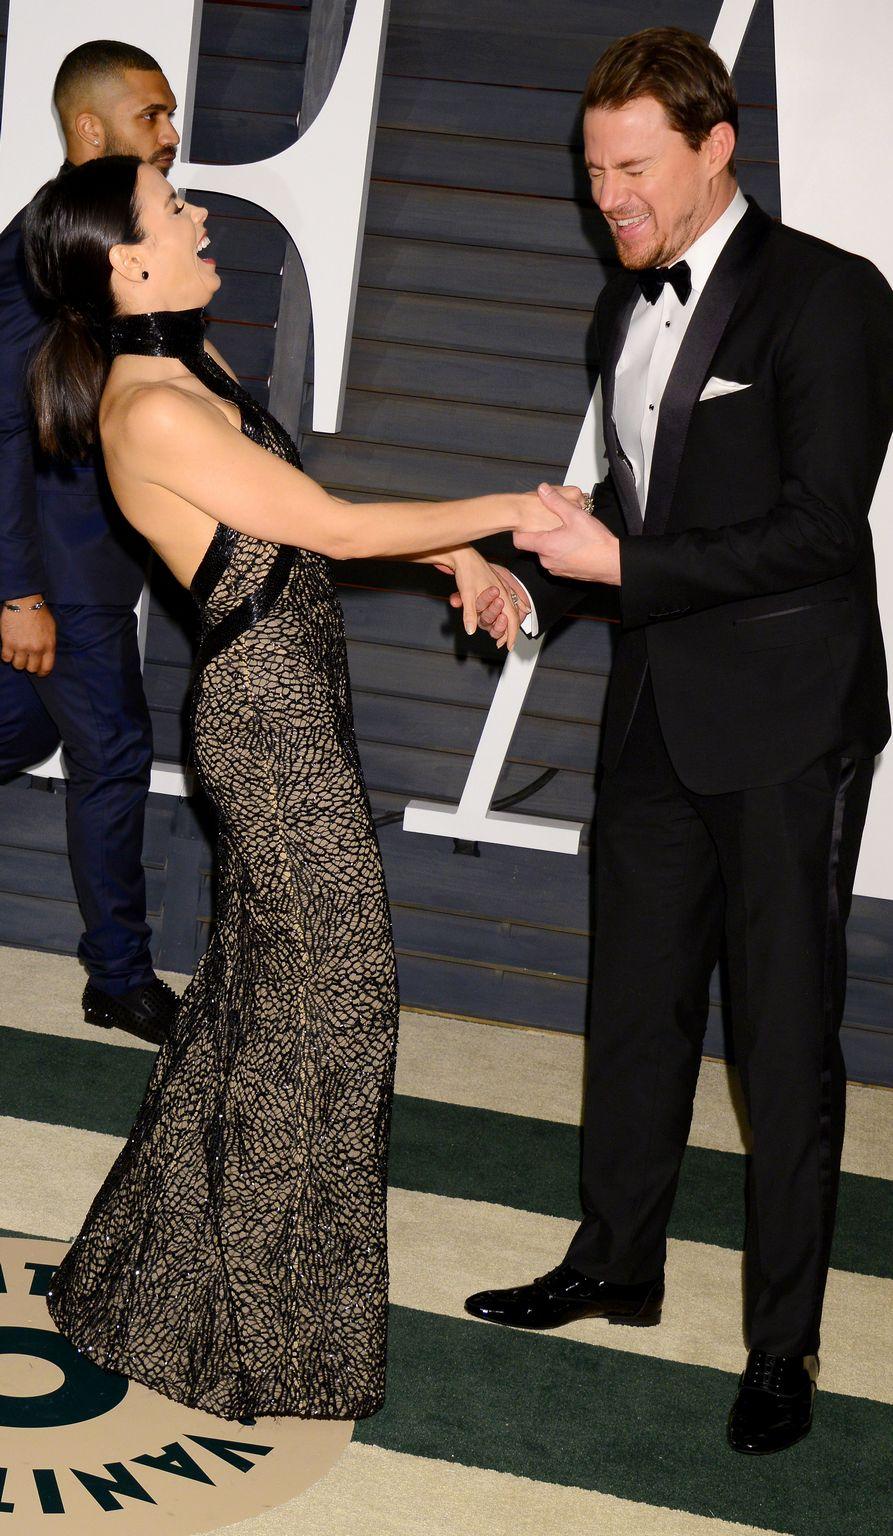 Channing Tatum and Jenna Dewan At Vanity Fair Oscar Party-4